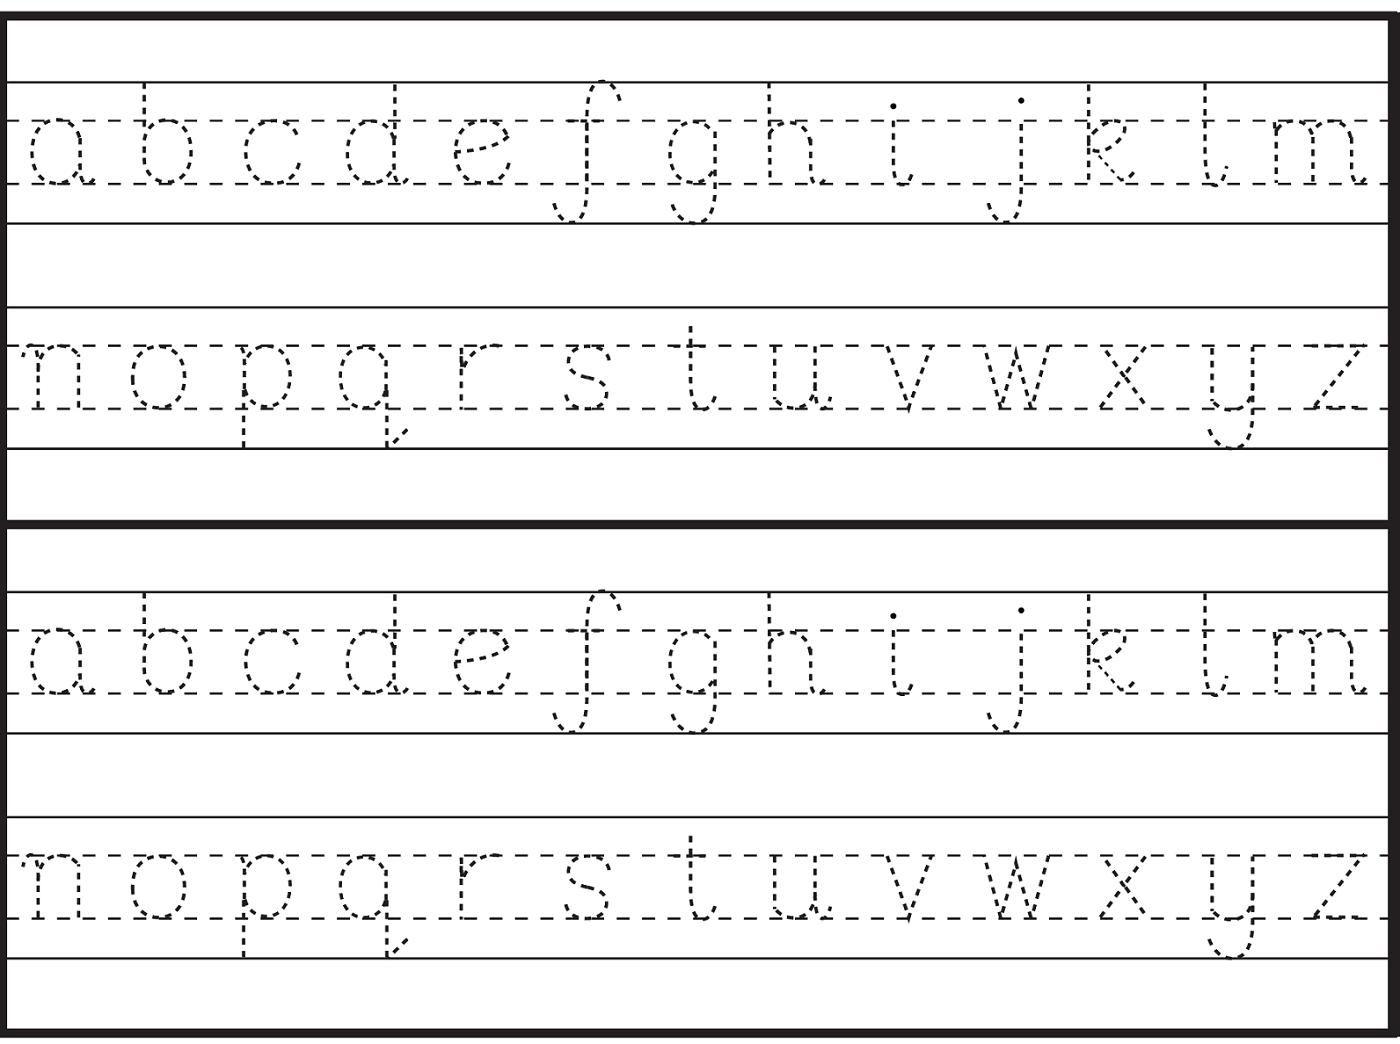 51 Alphabet Worksheets For Grade 1 In